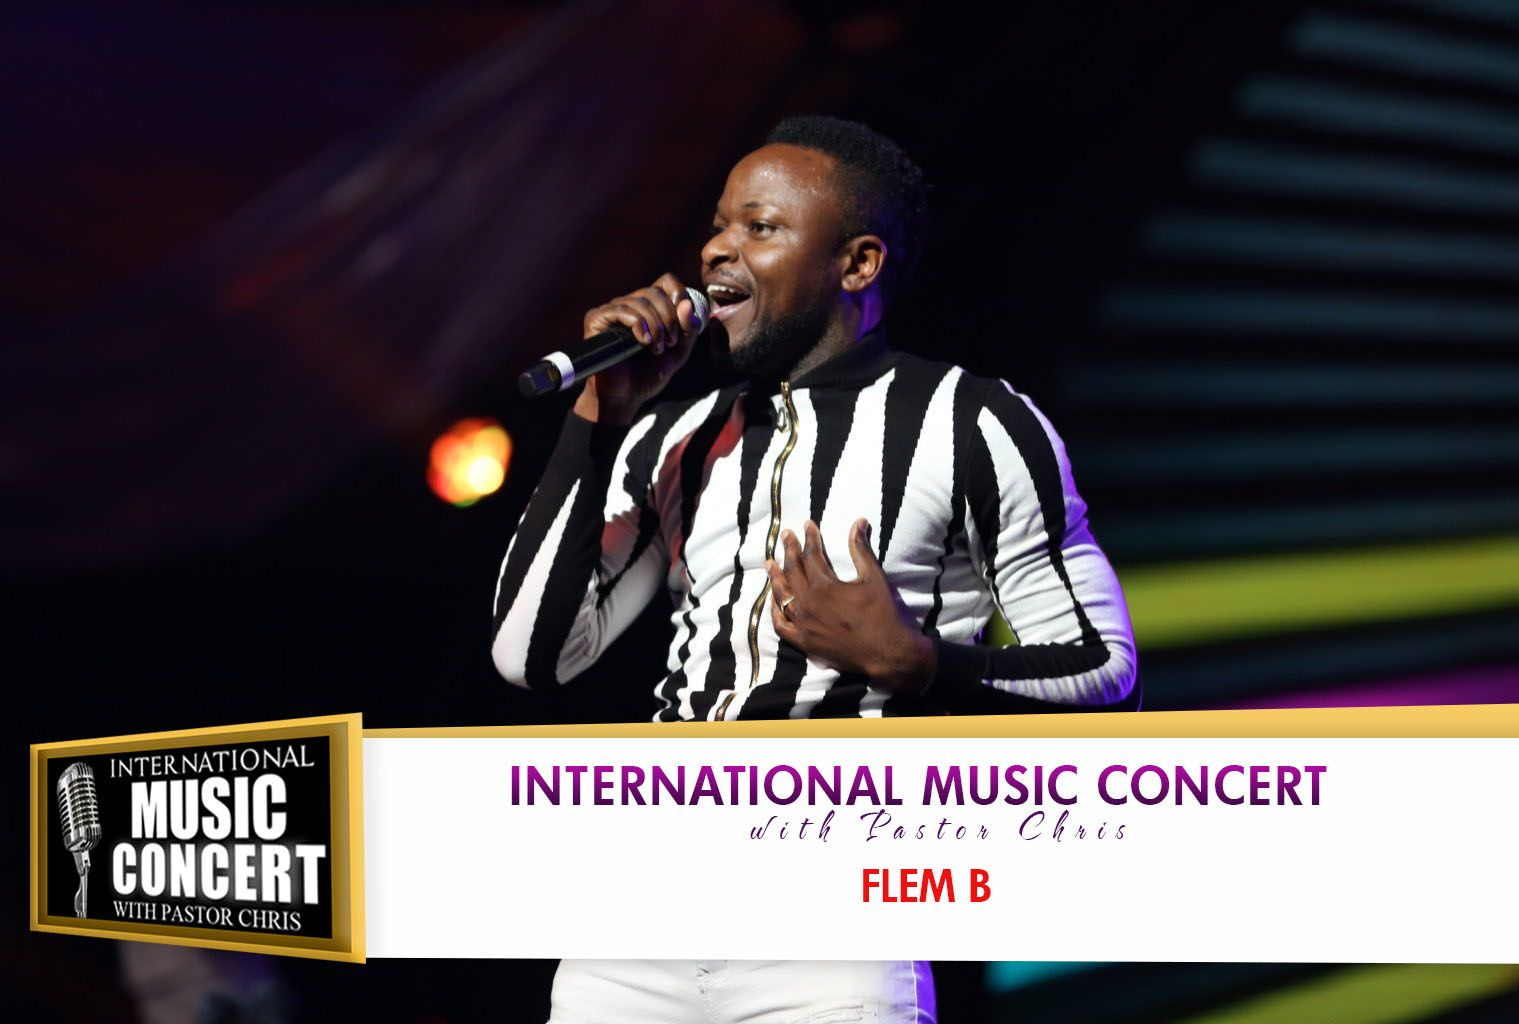 Pin on International Music